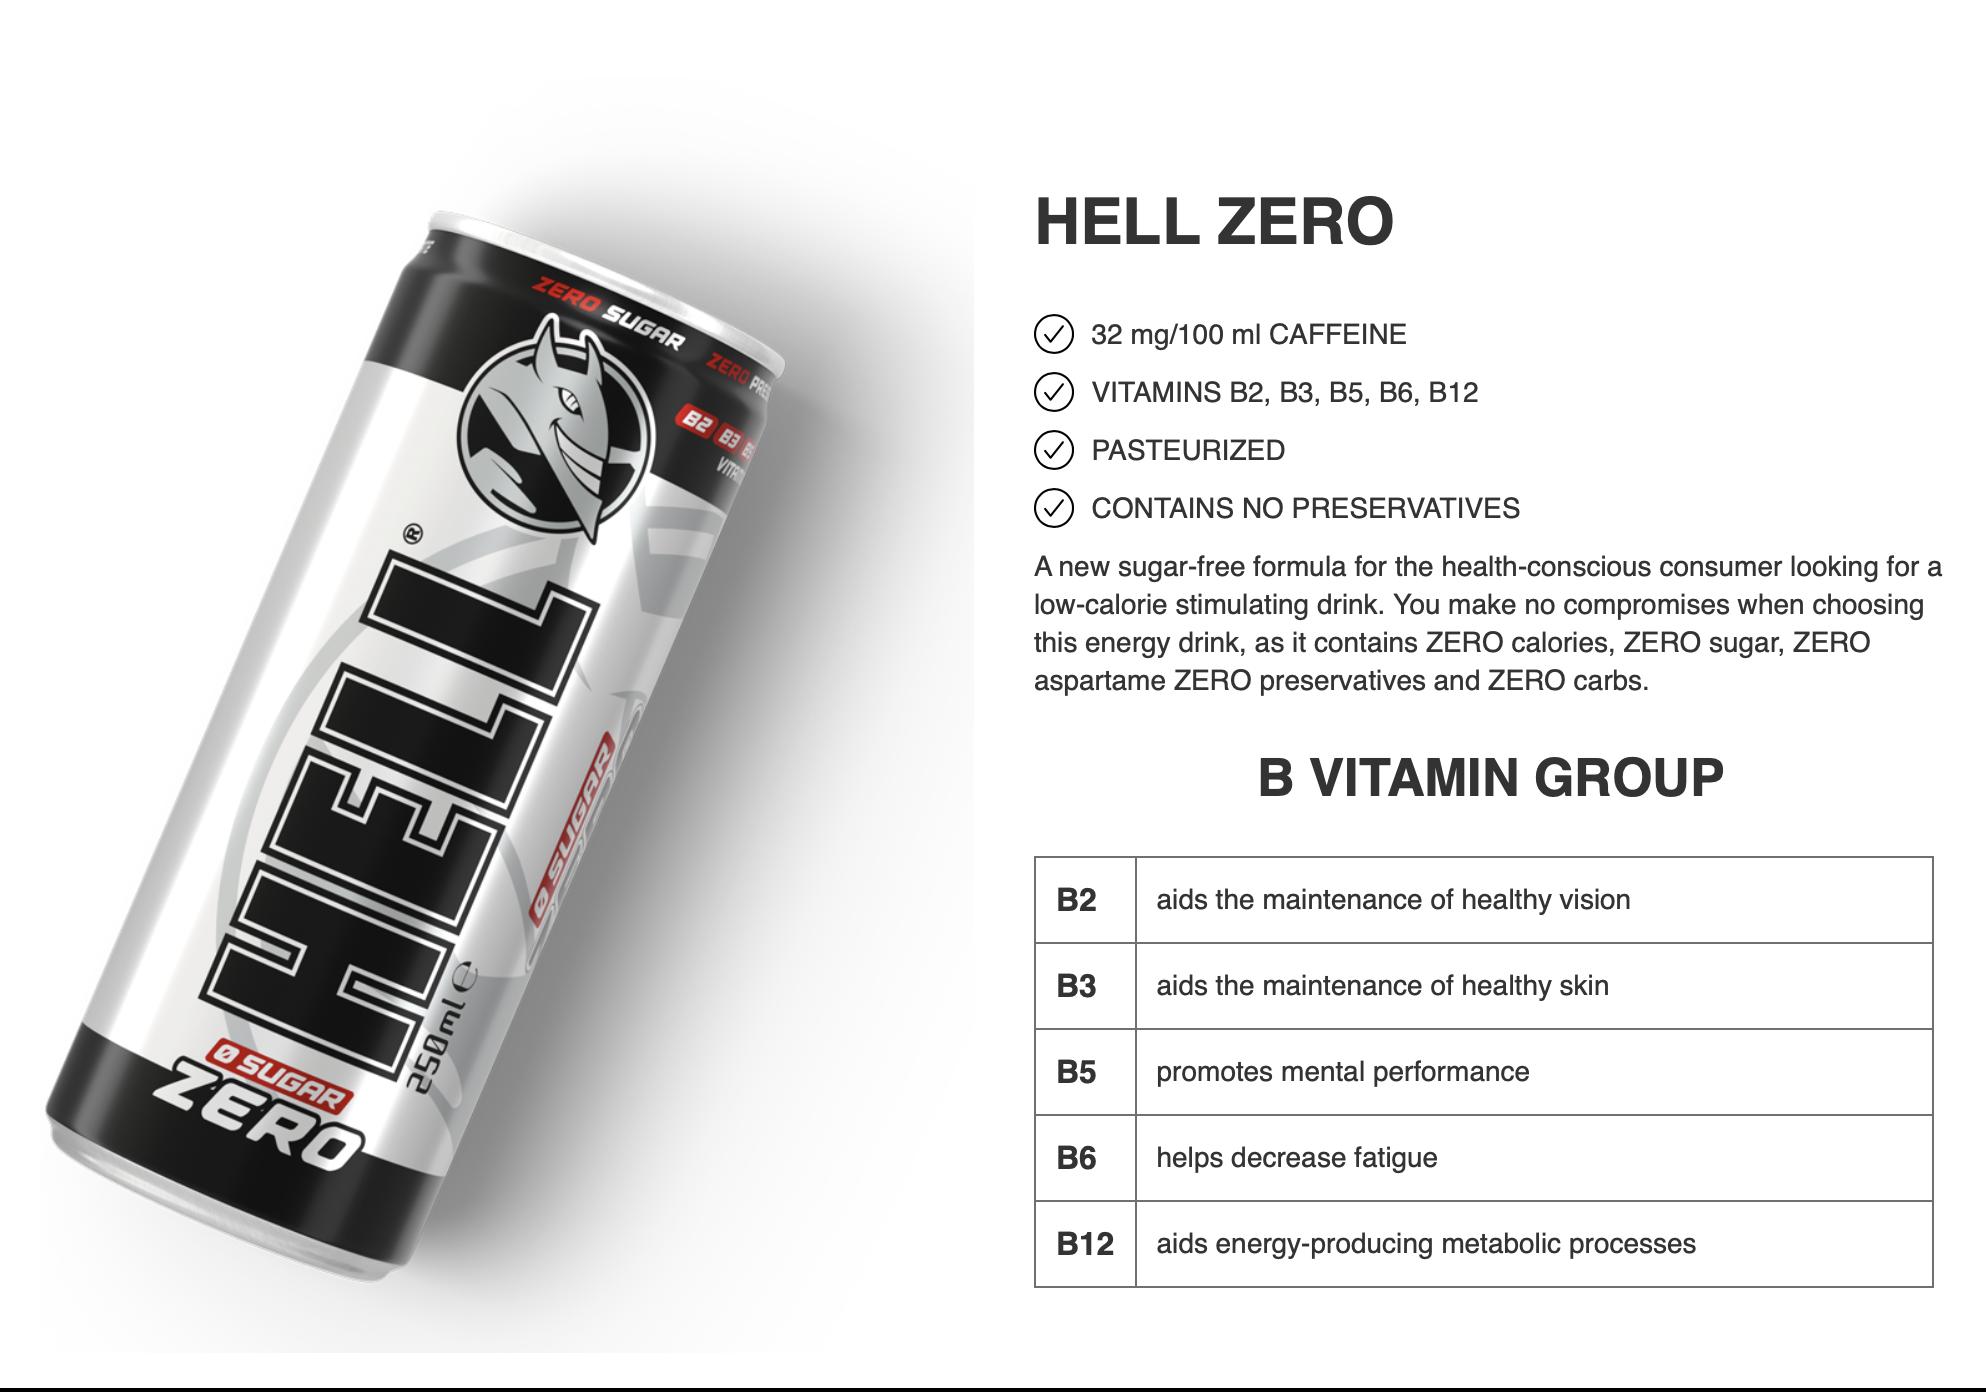 Hell energy